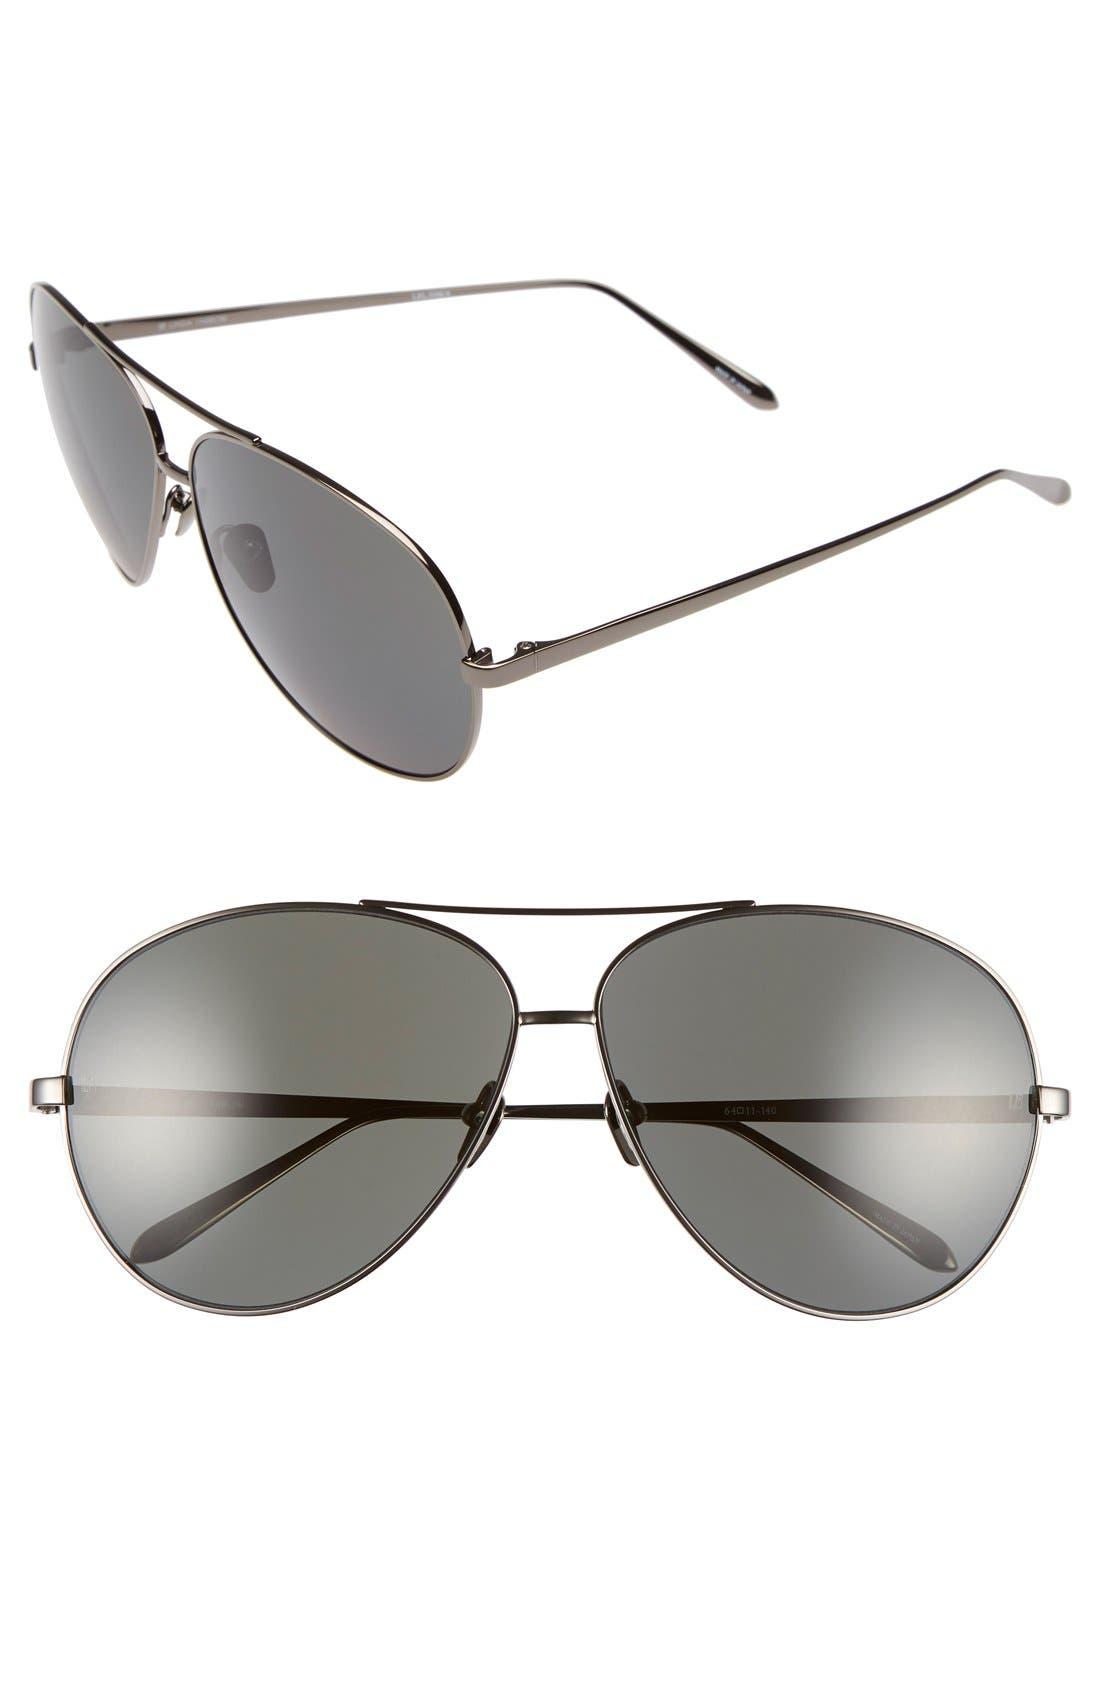 Main Image - Linda Farrow 64mm Aviator Sunglasses